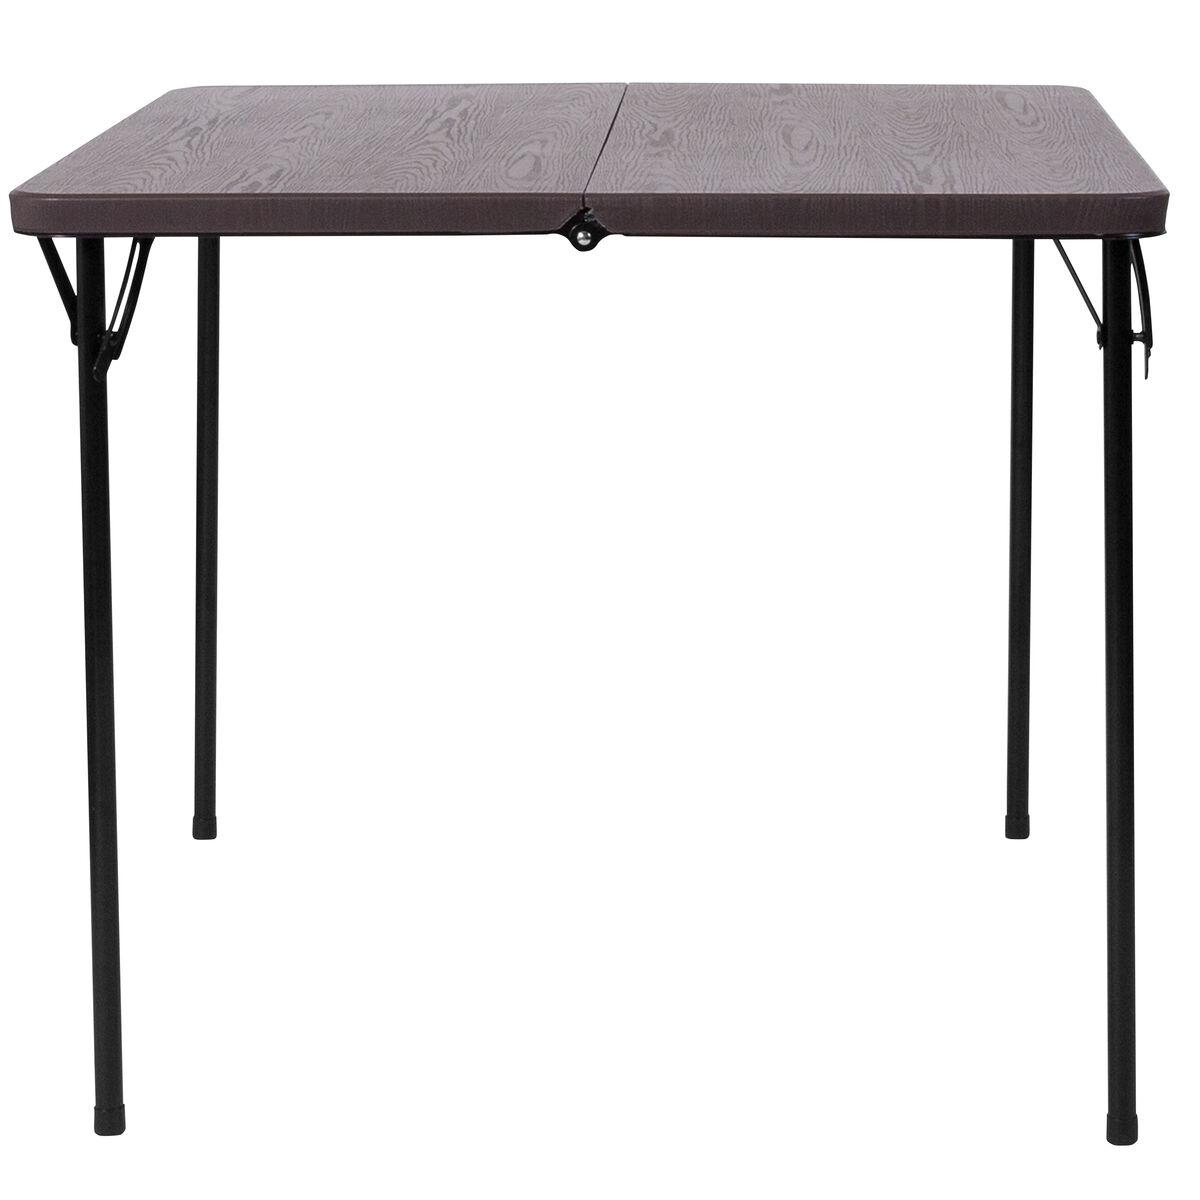 34sq brown plastic fold table dad lf 86 gg bestchiavarichairs com